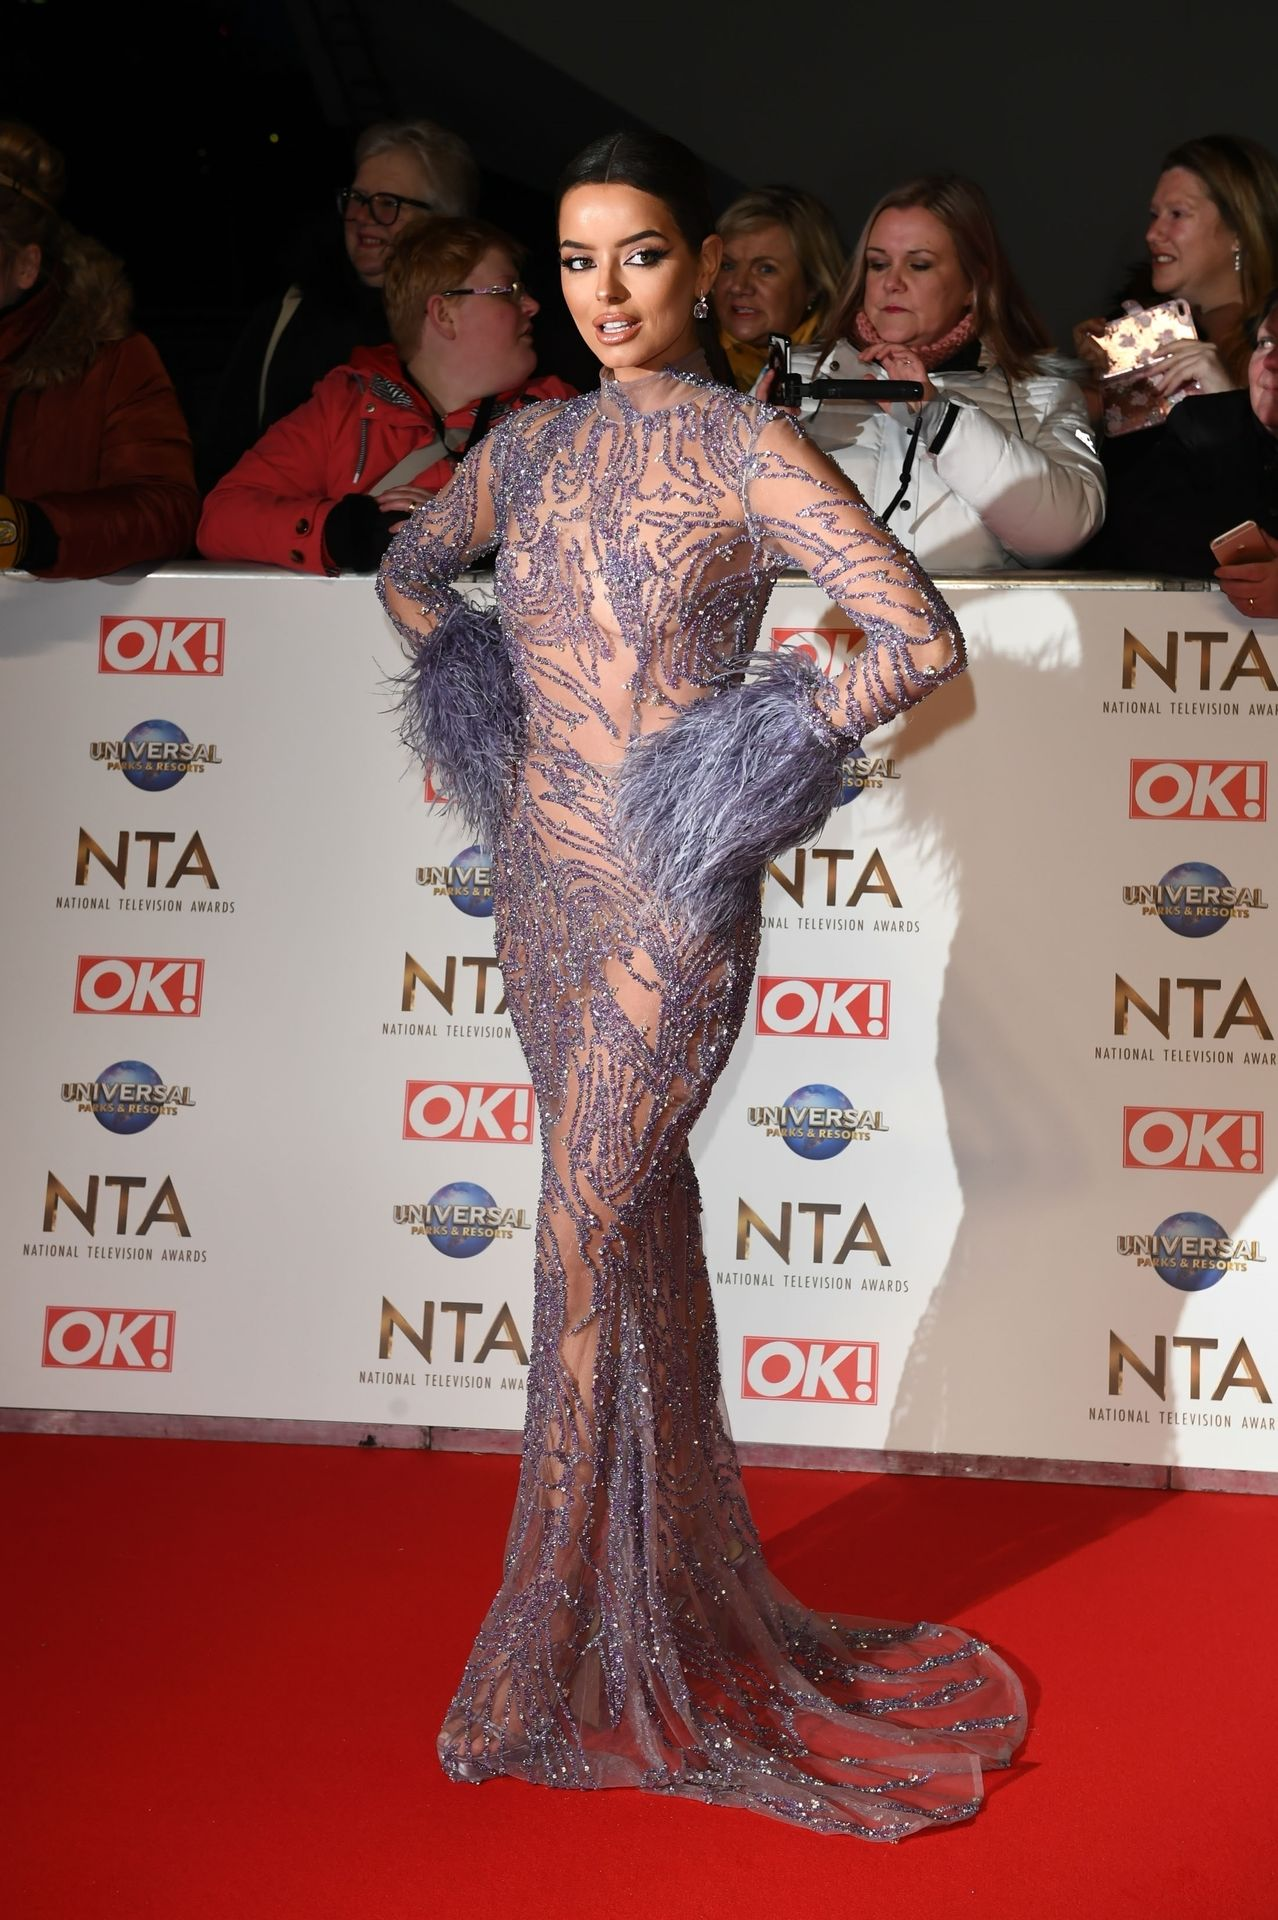 Maura Higgins Looks Hot At The National Television Awards 0002